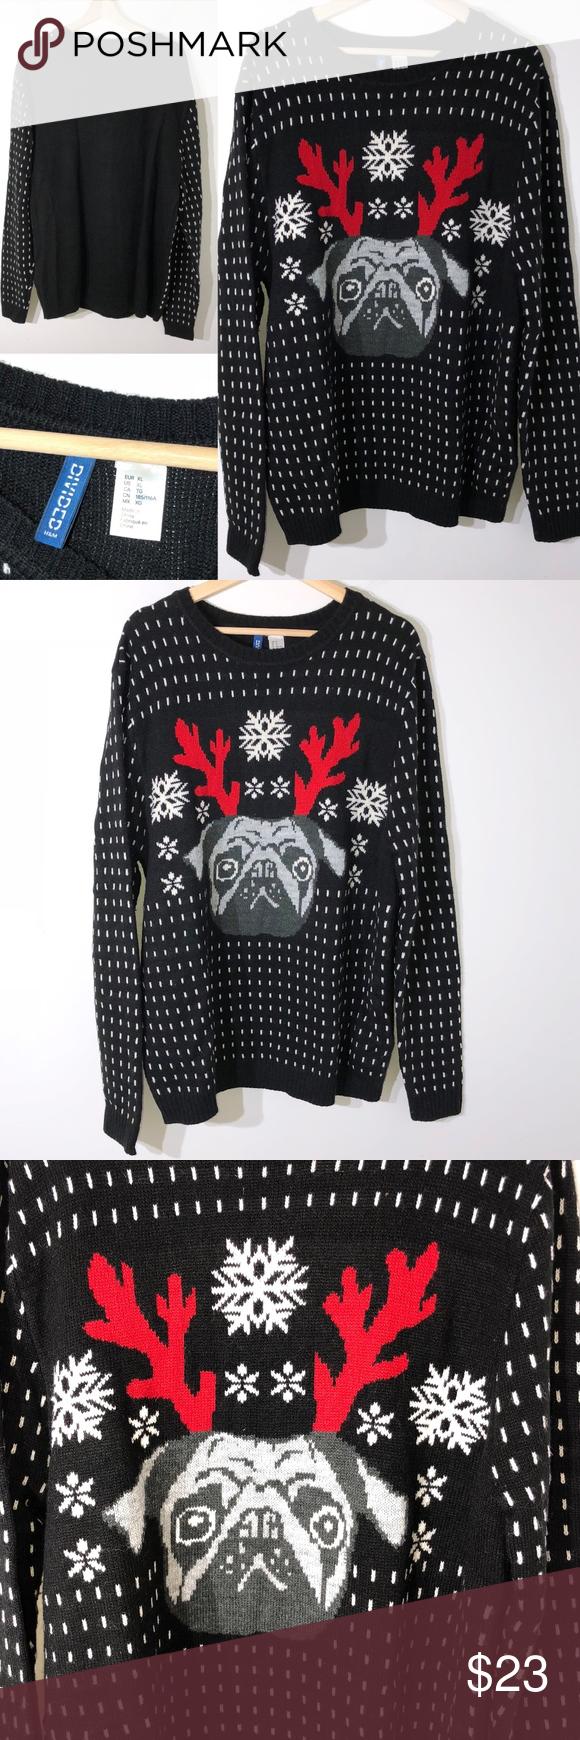 c25f8742da71 H & M Christmas sweater size XL pug antlers 1516 #N Brand: H & M CHRISTMAS  SWEATER SNOWFLAKES WITH IMAGE OF PUG DOG WEARING ANTLERS.